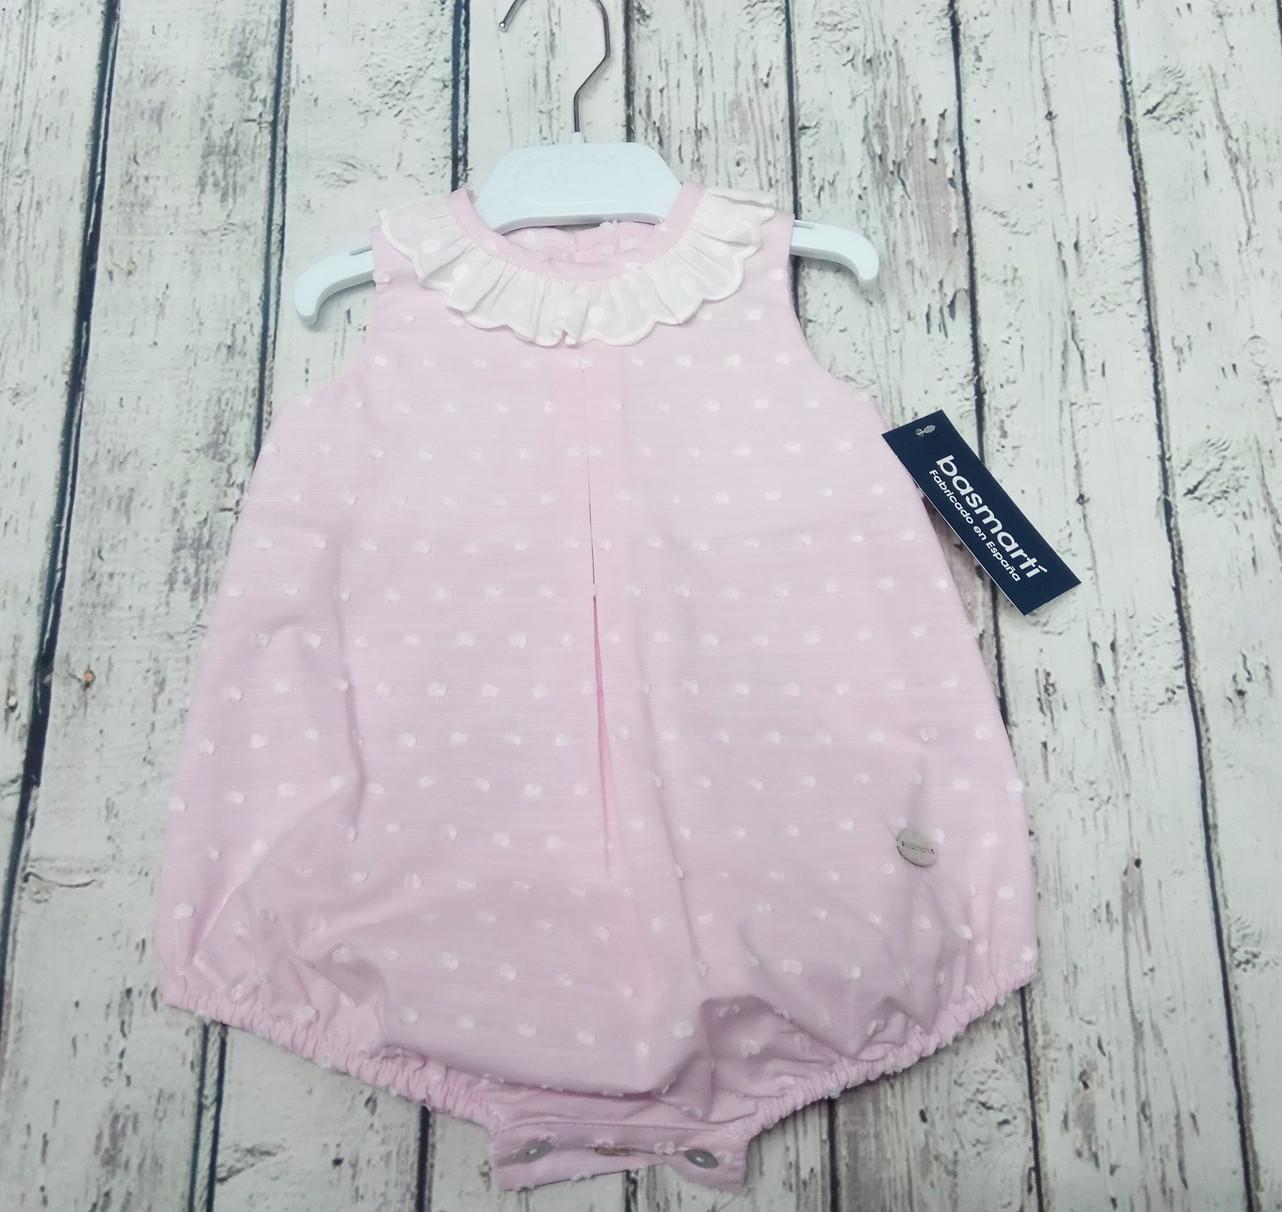 Pelele de bebé en plumeti rosa de Basmarti.